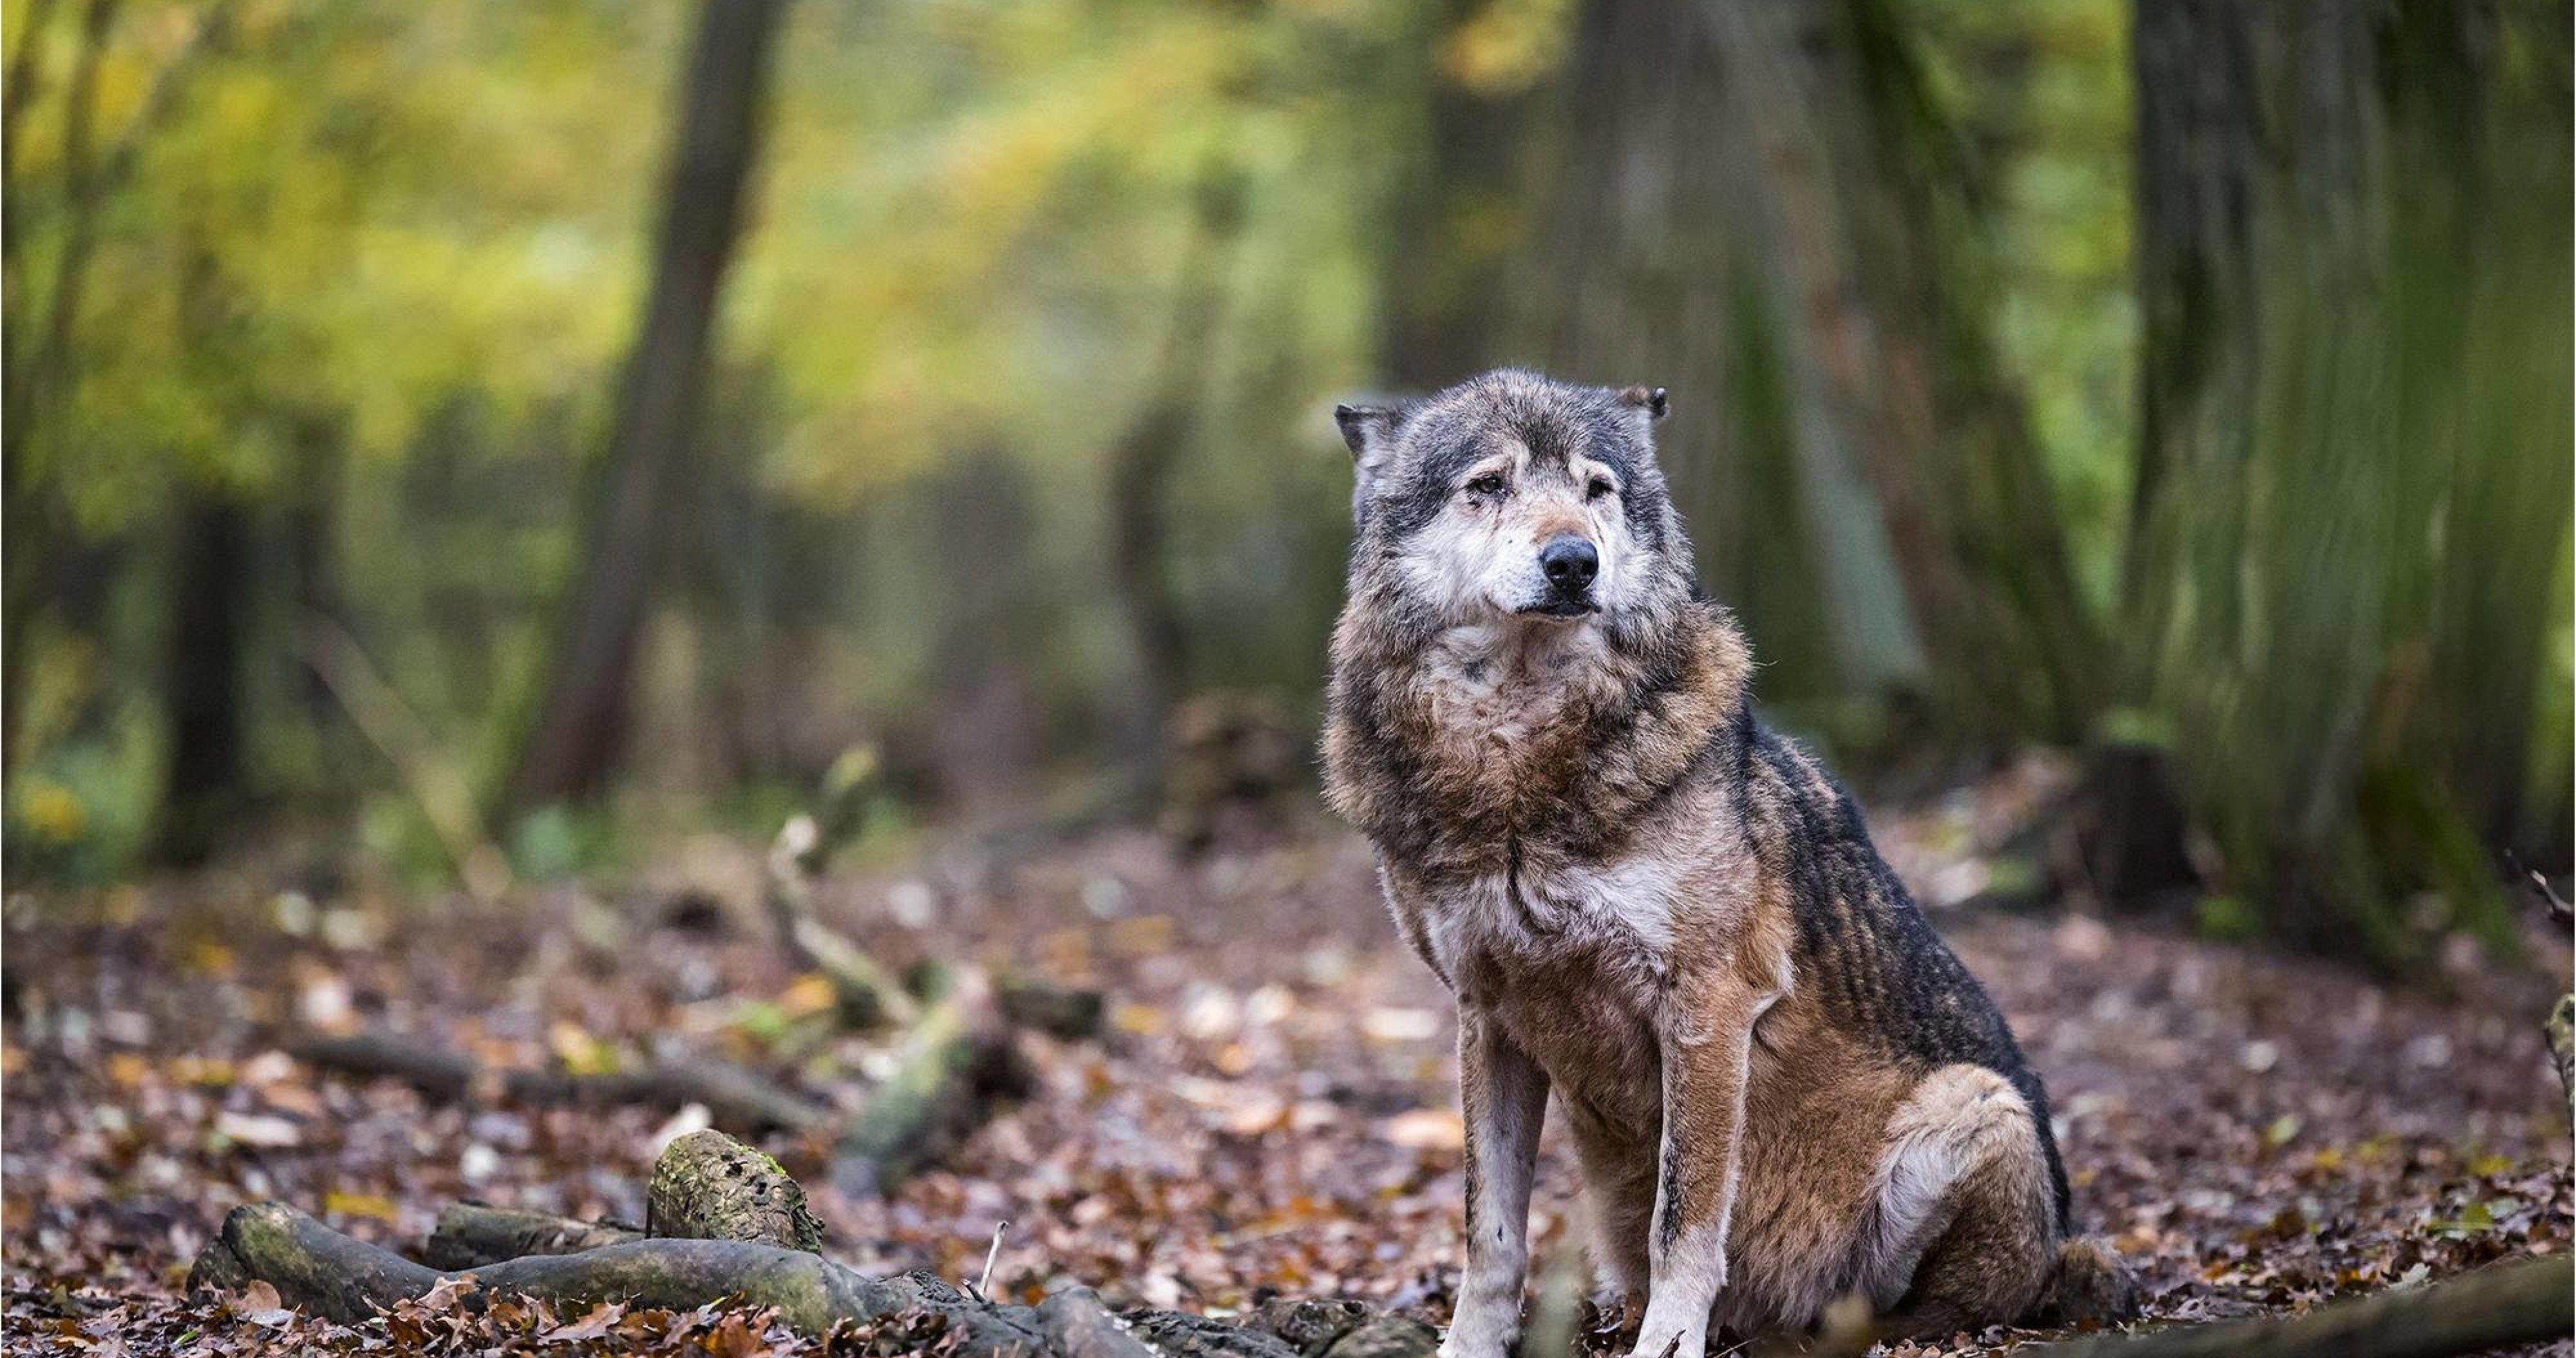 the wolf in forest 4k ultra hd wallpaper Ultra hd Wolf